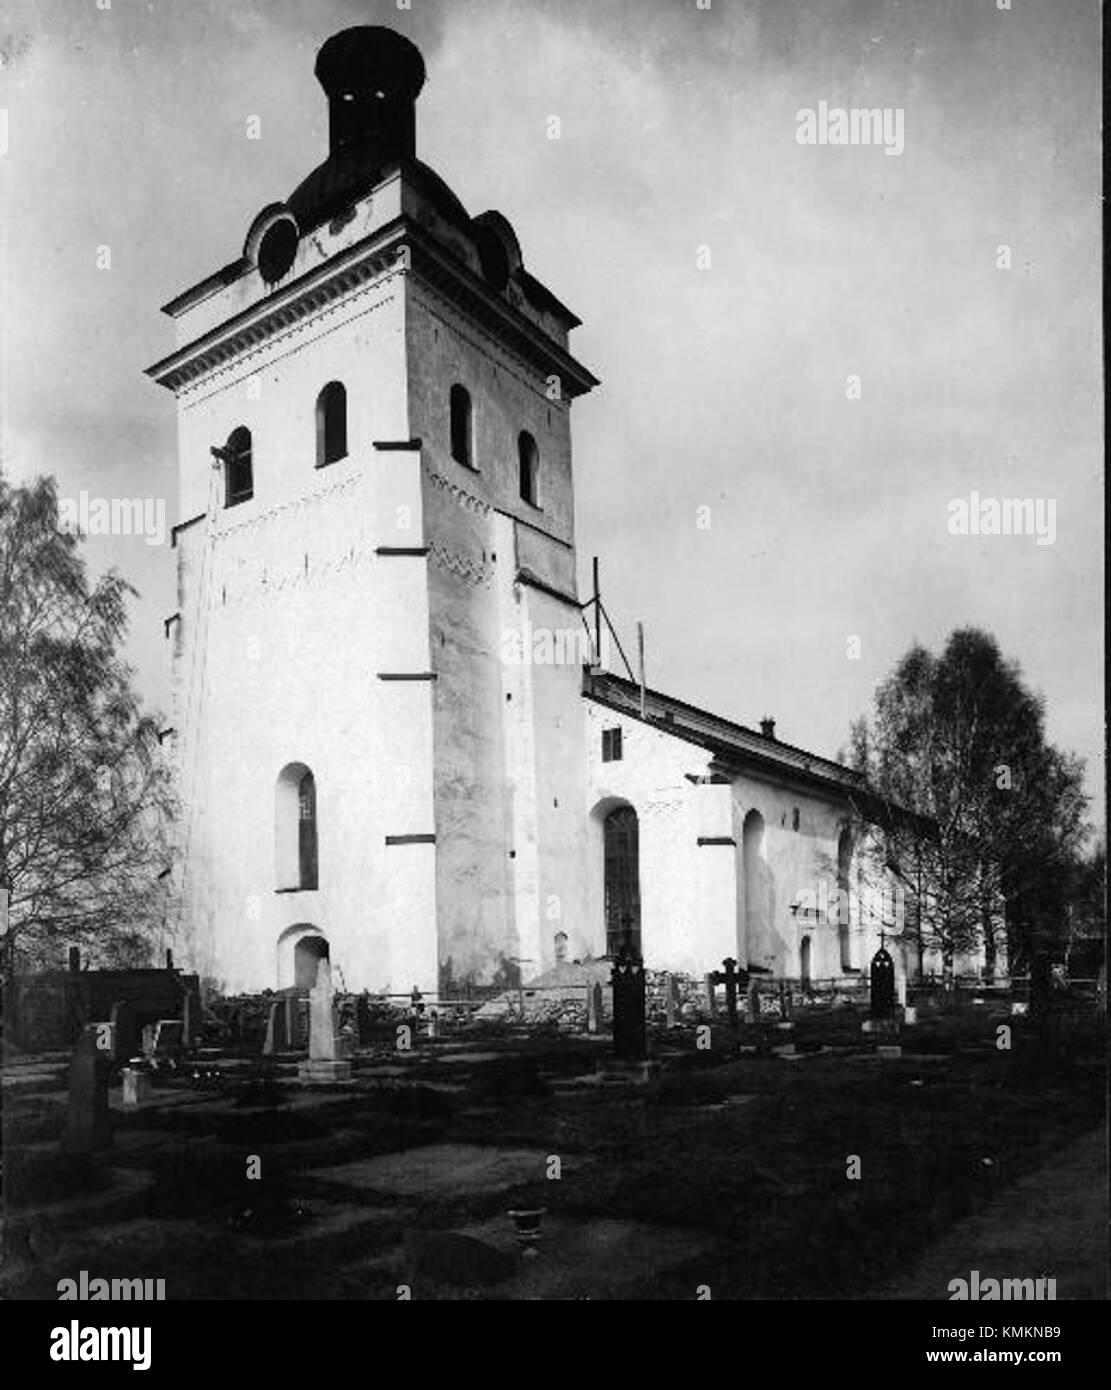 Eliasson - Public Member Photos & Scanned - Ancestry